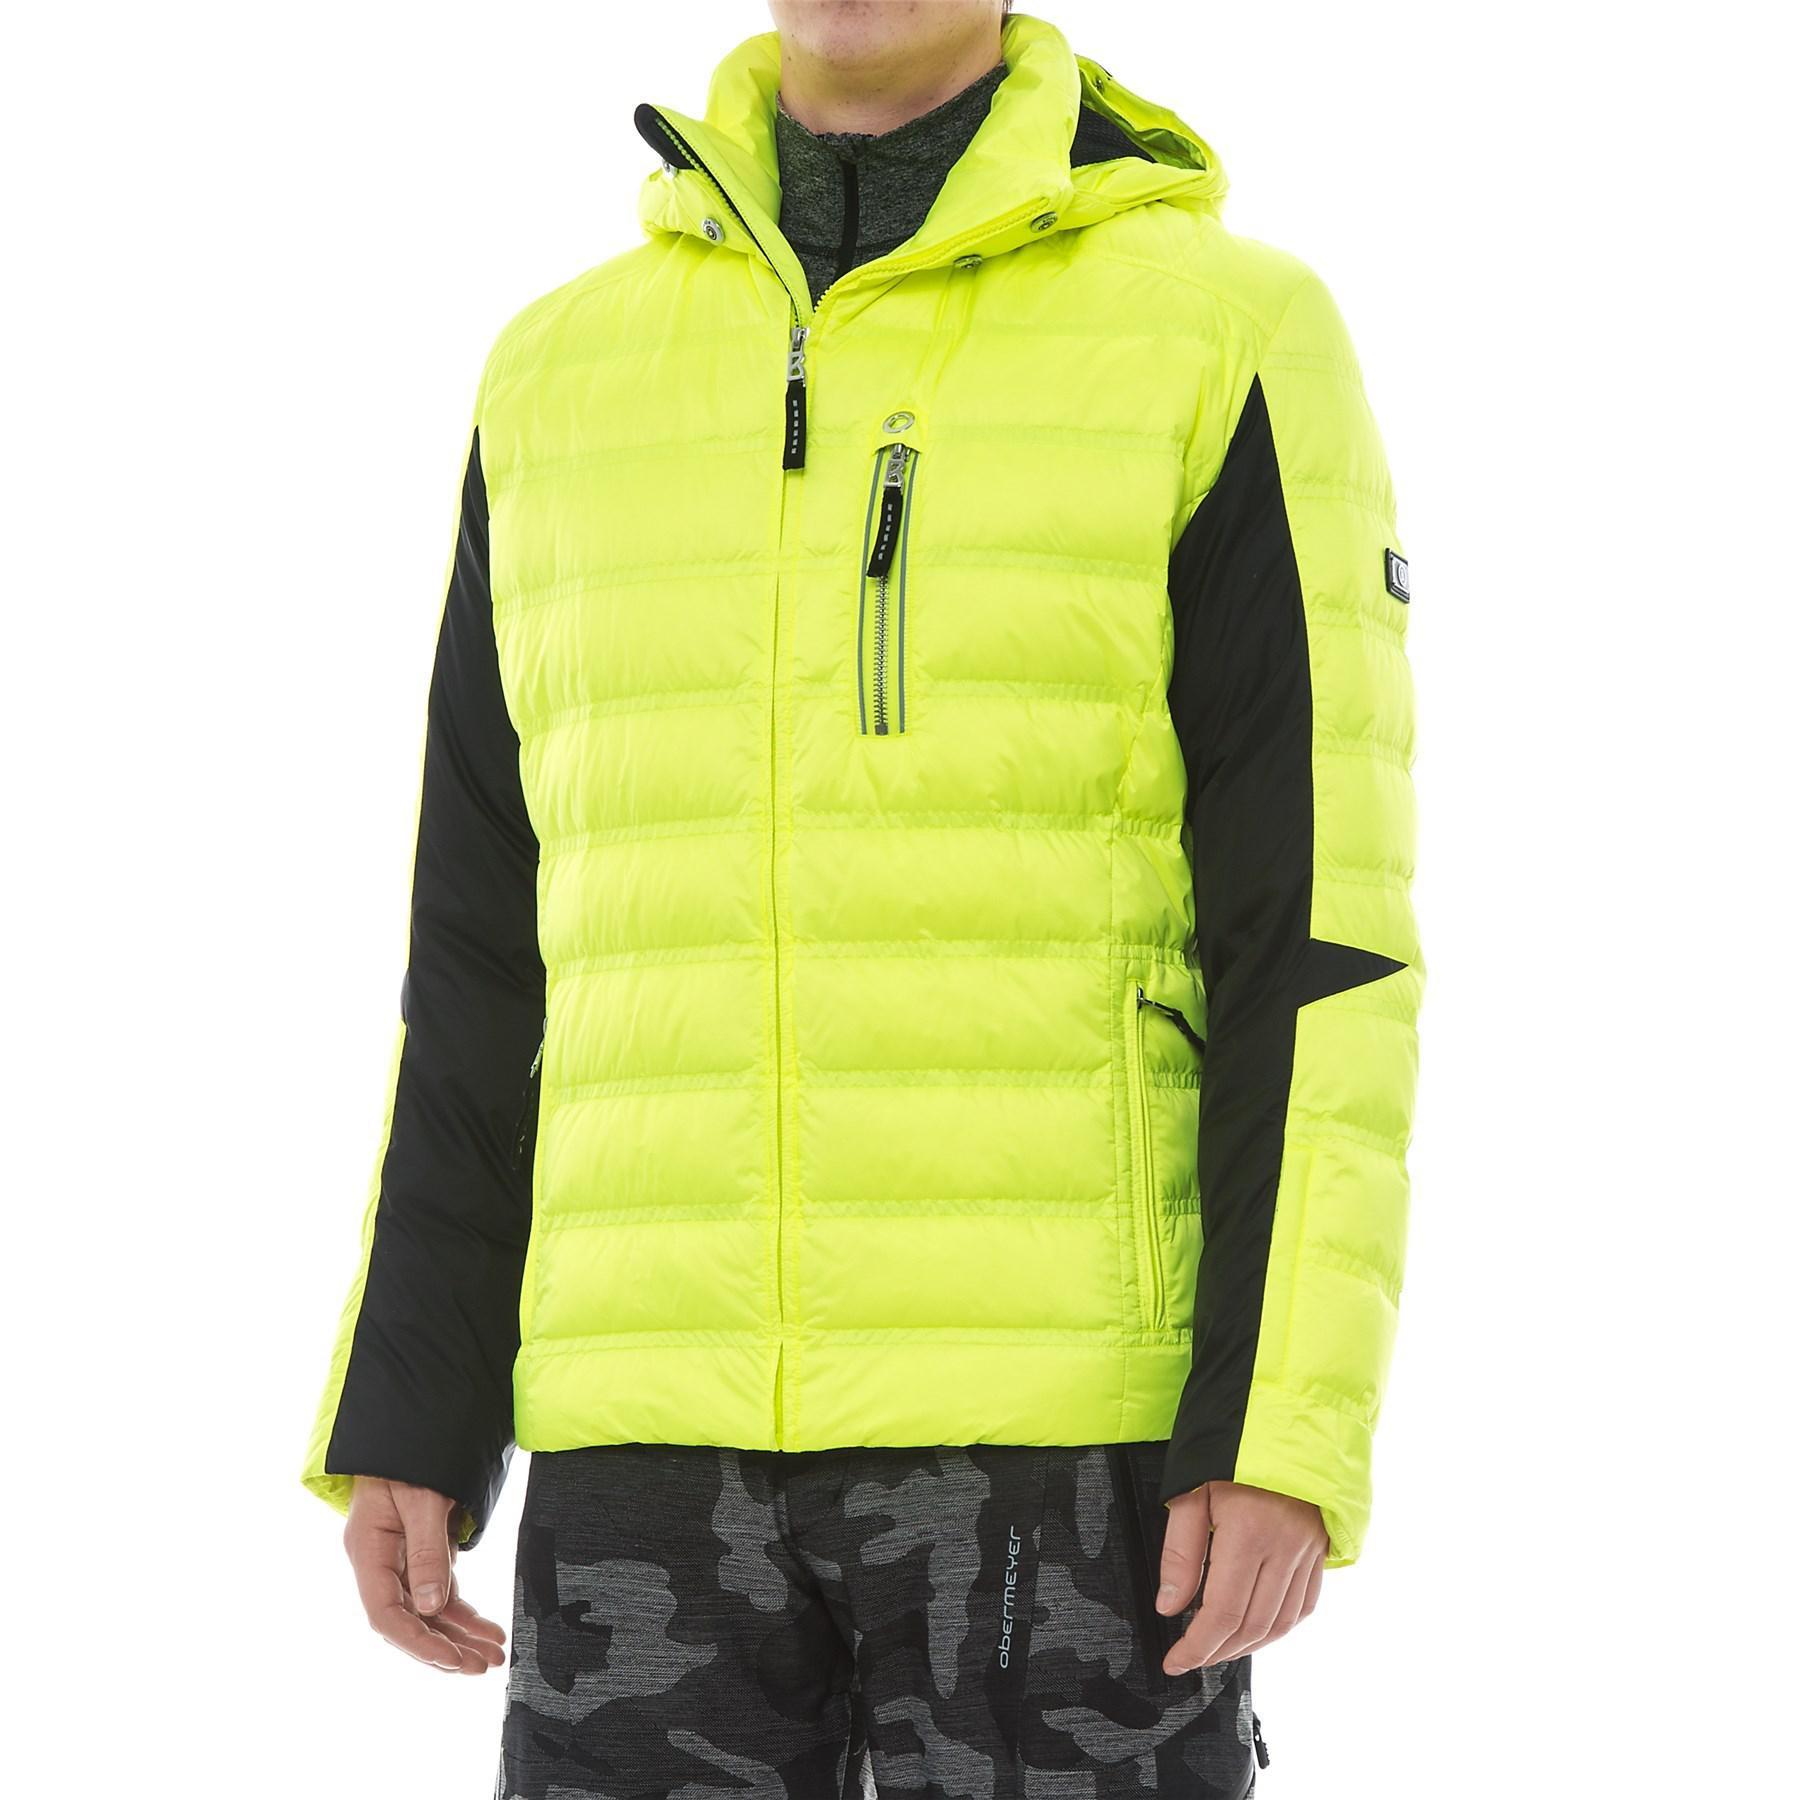 559b24d0 Bogner Adrian-d Down Ski Jacket (for Men) in Yellow for Men - Lyst